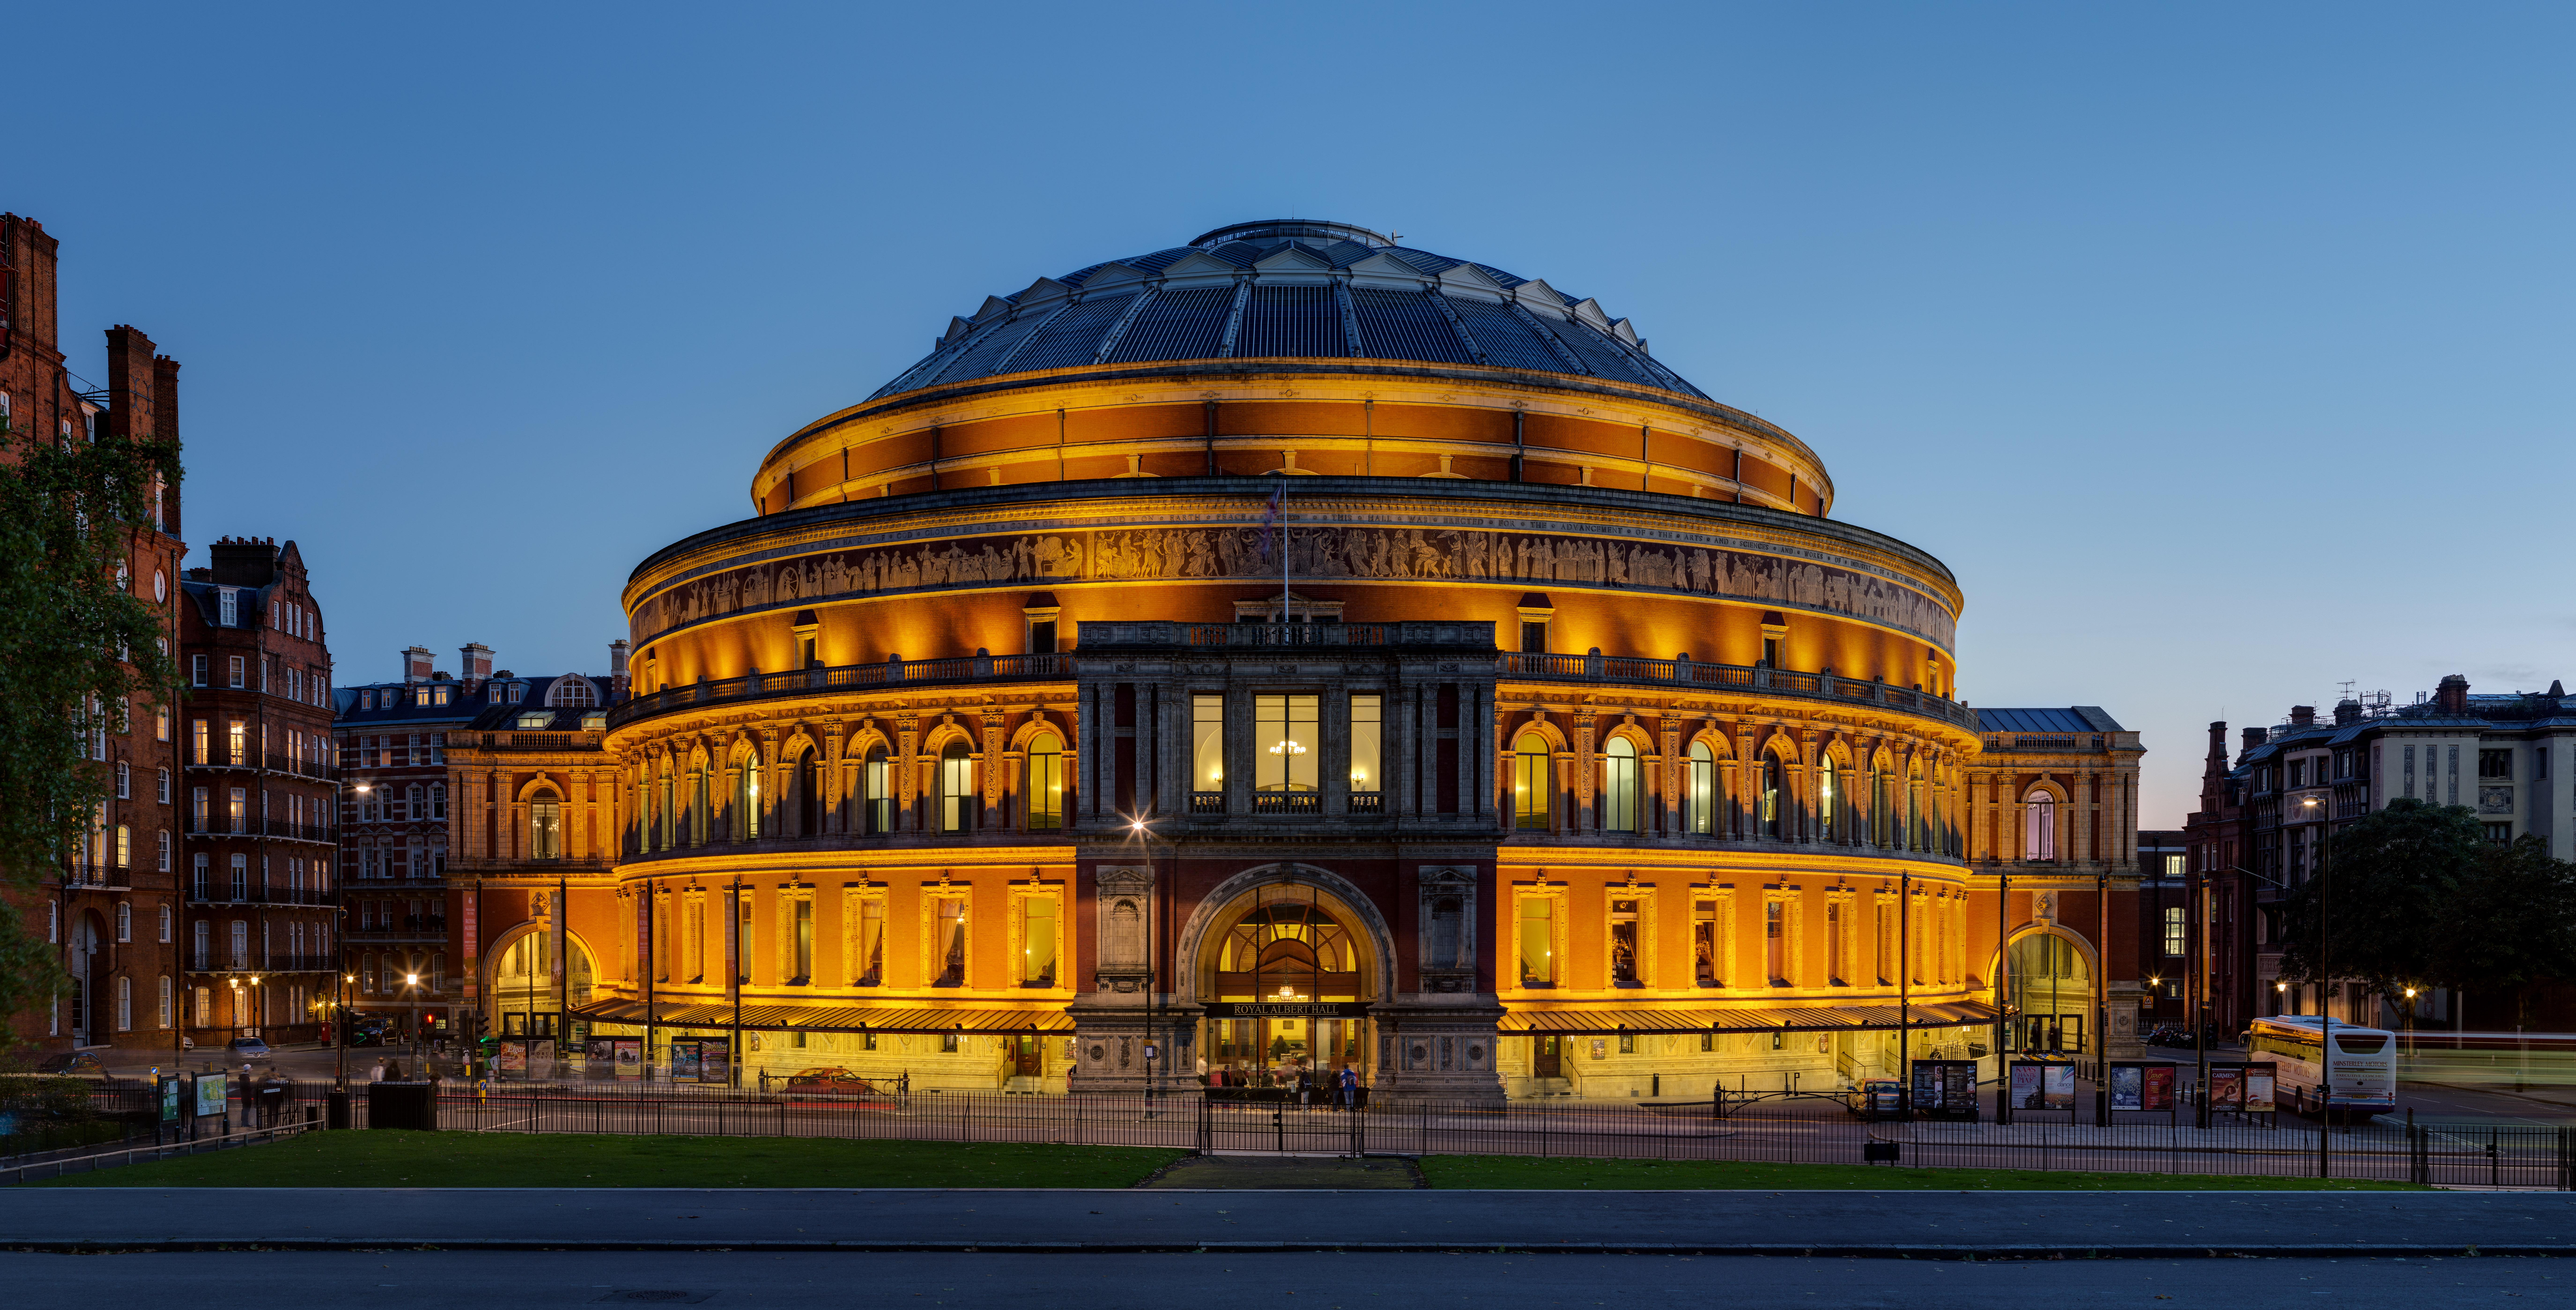 File:Royal Albert Hall, London - Nov 2012.jpg - Wikipedia, the free ...